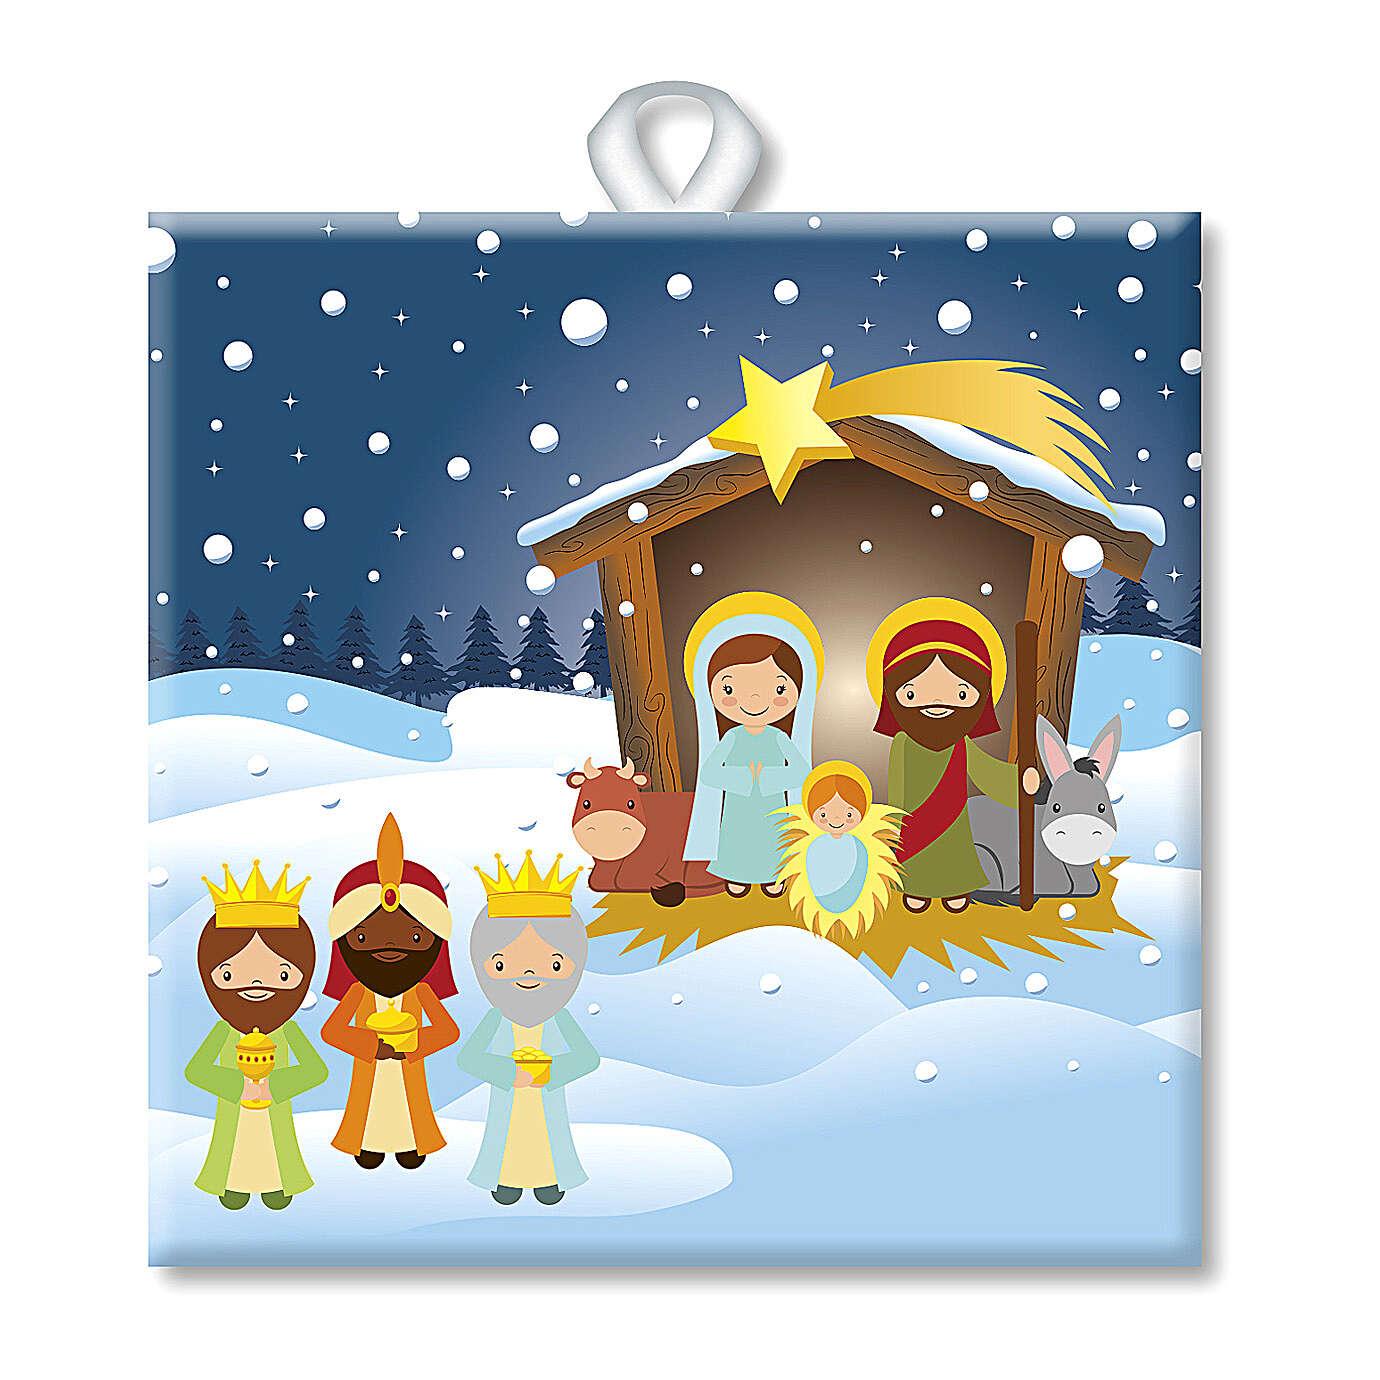 Printed Christmas tile with Holy Family Three Kings back prayer 3